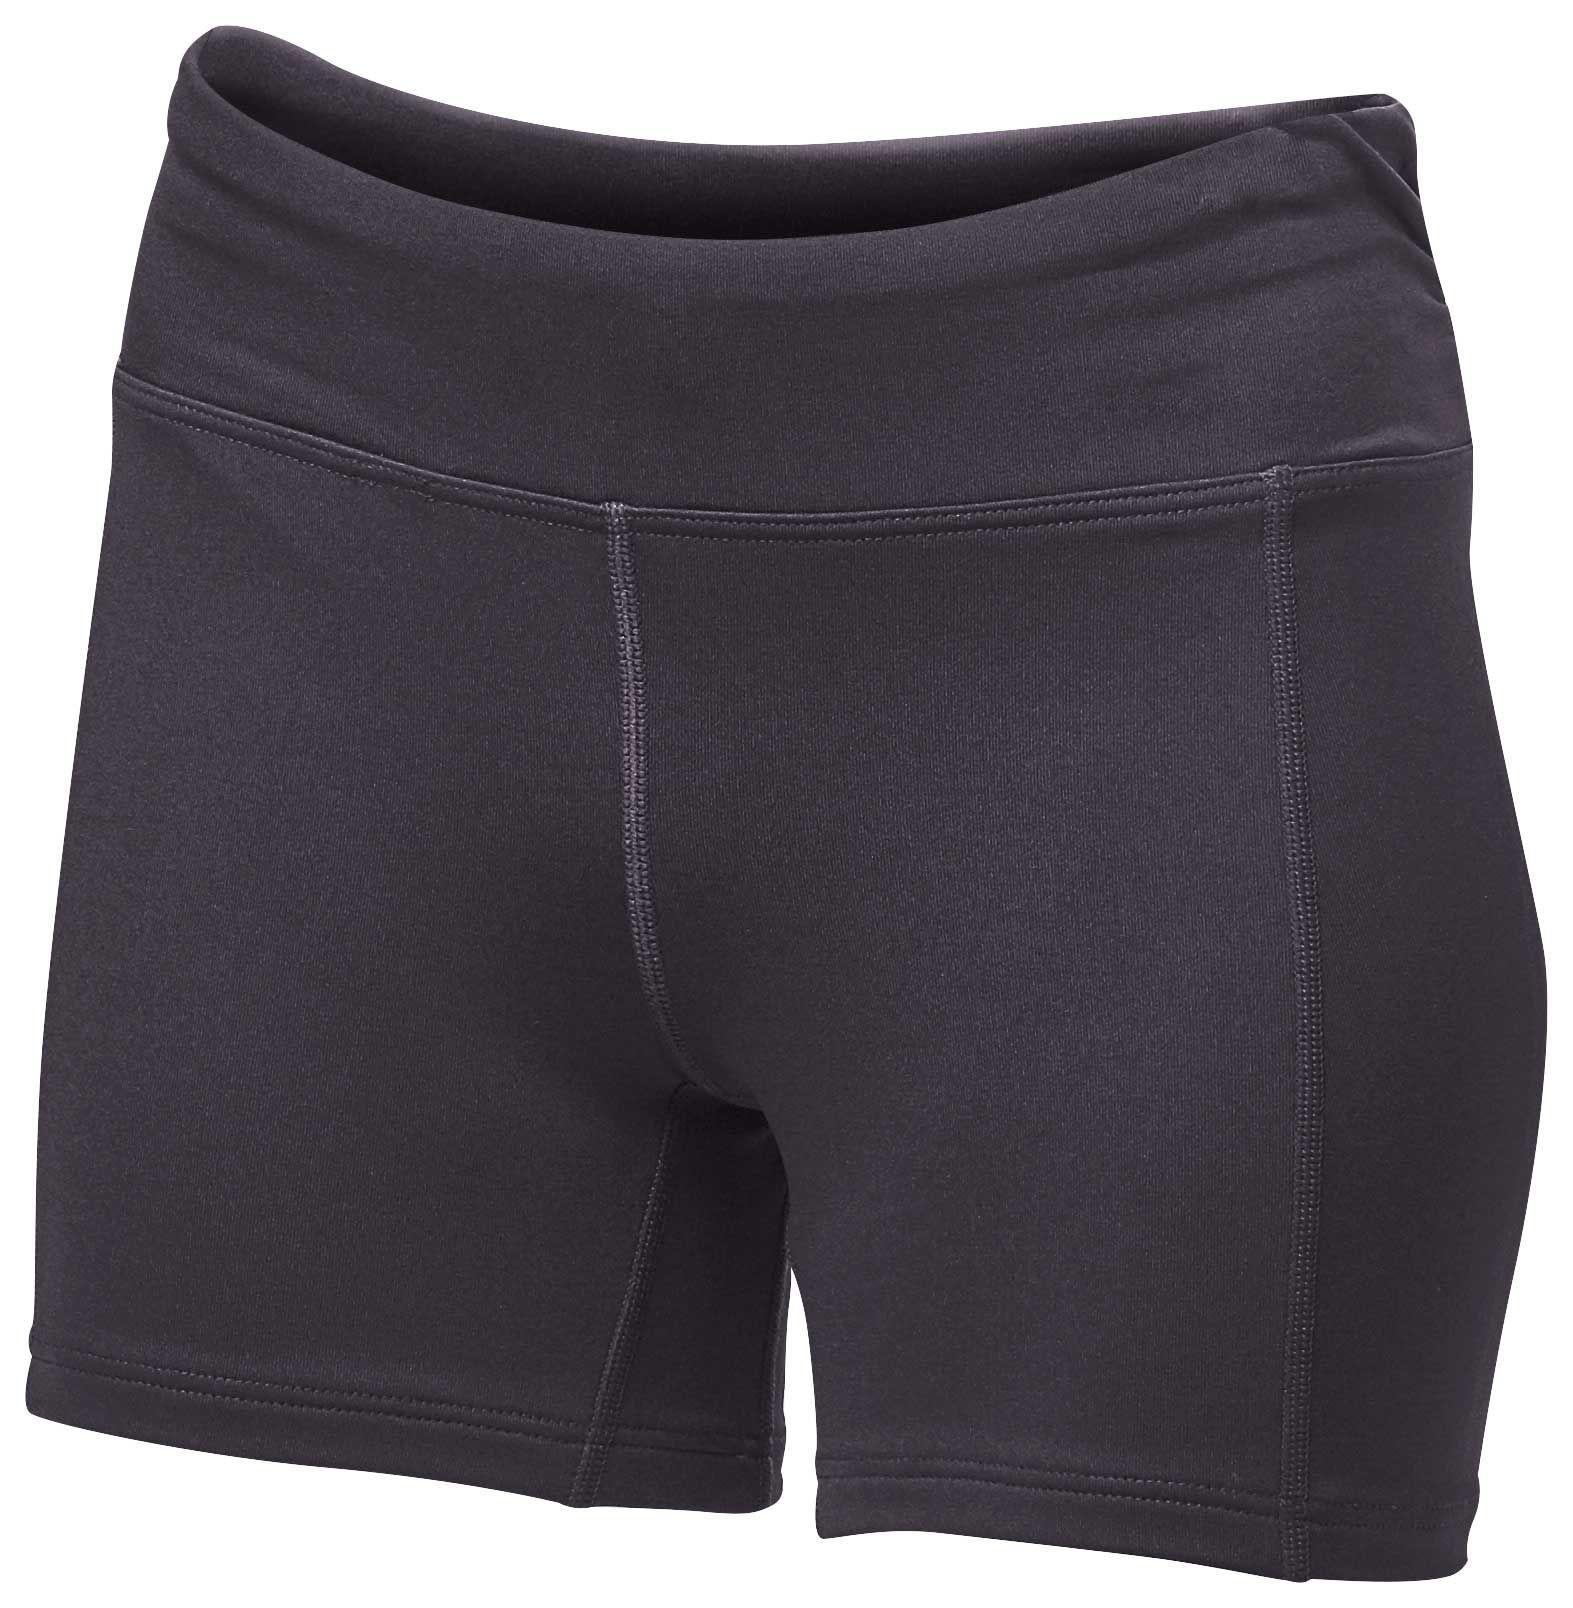 b57f850431d TYR Women's Kalani Solid Swim Shorts, Size: XS, Black in 2019 ...